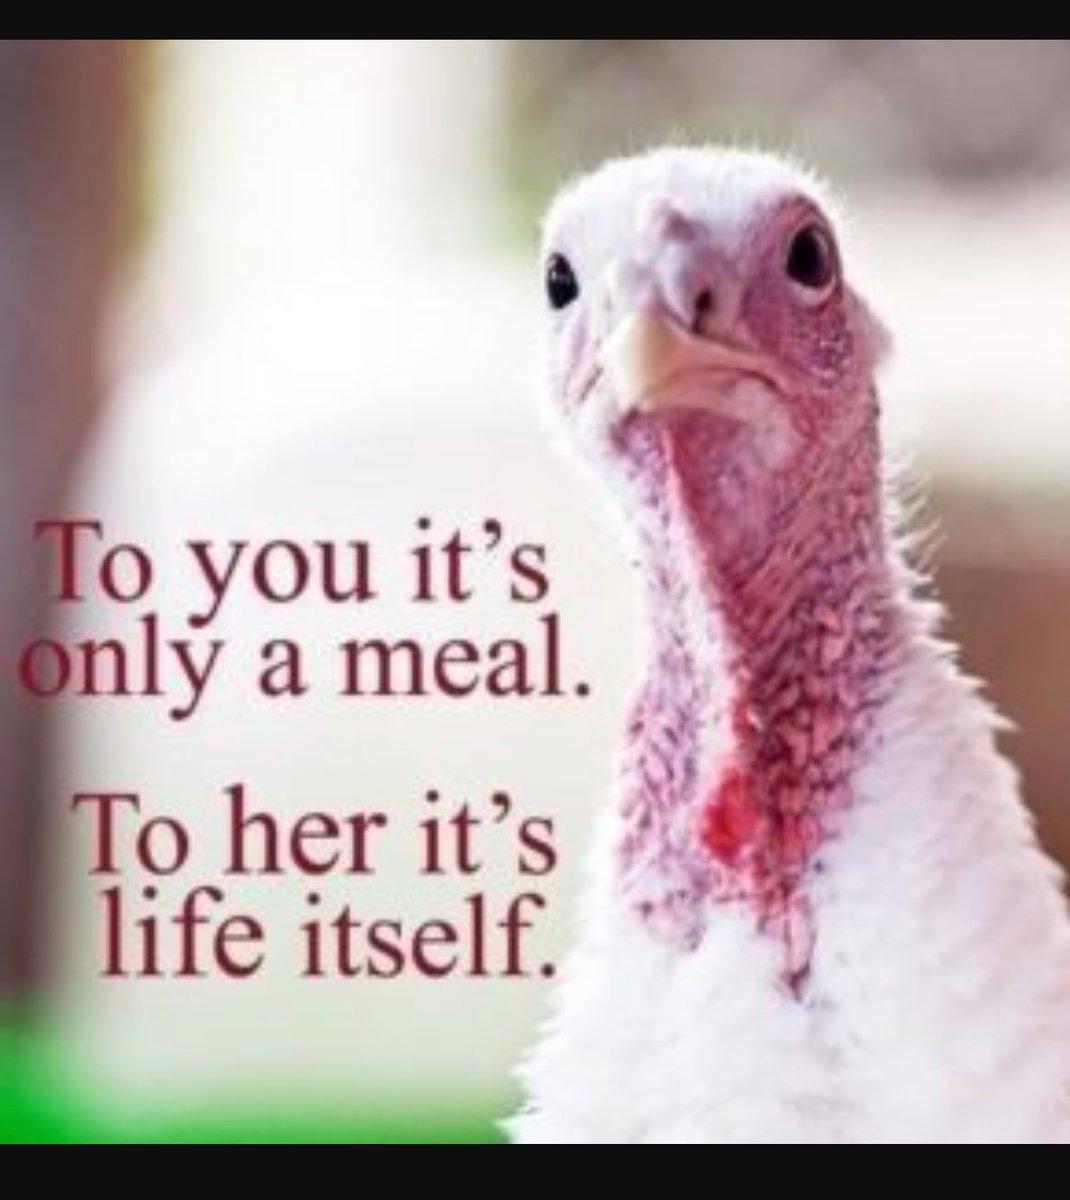 Happy thanksgiving #thanksgiving xJZ9PubeeL